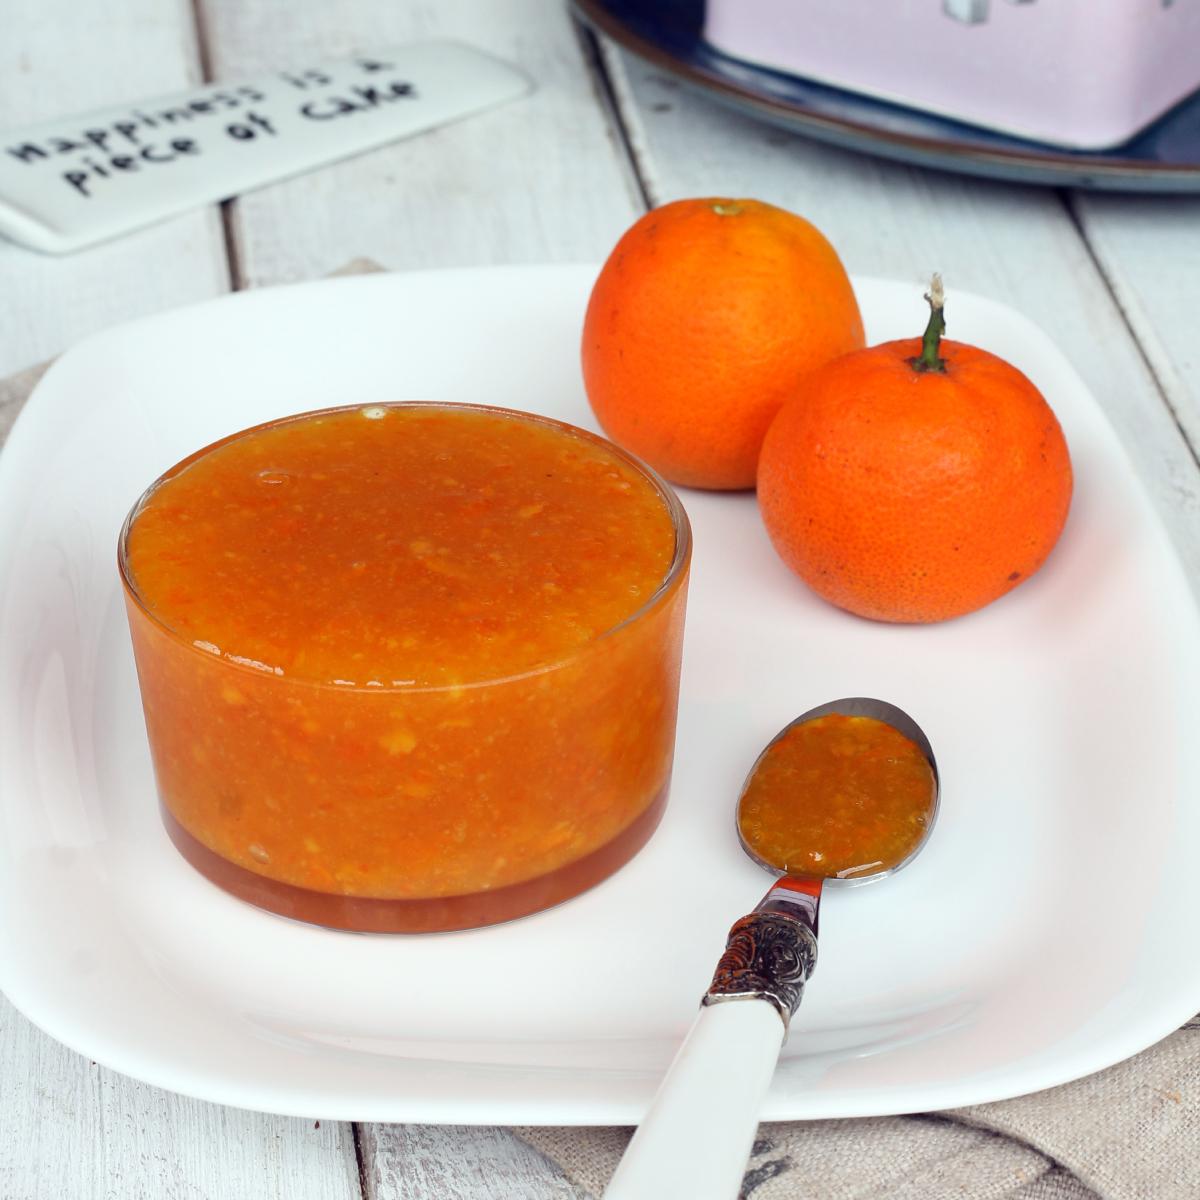 MARMELLATA di MANDARINI SENZA BUCCIA   marmellata di clementine